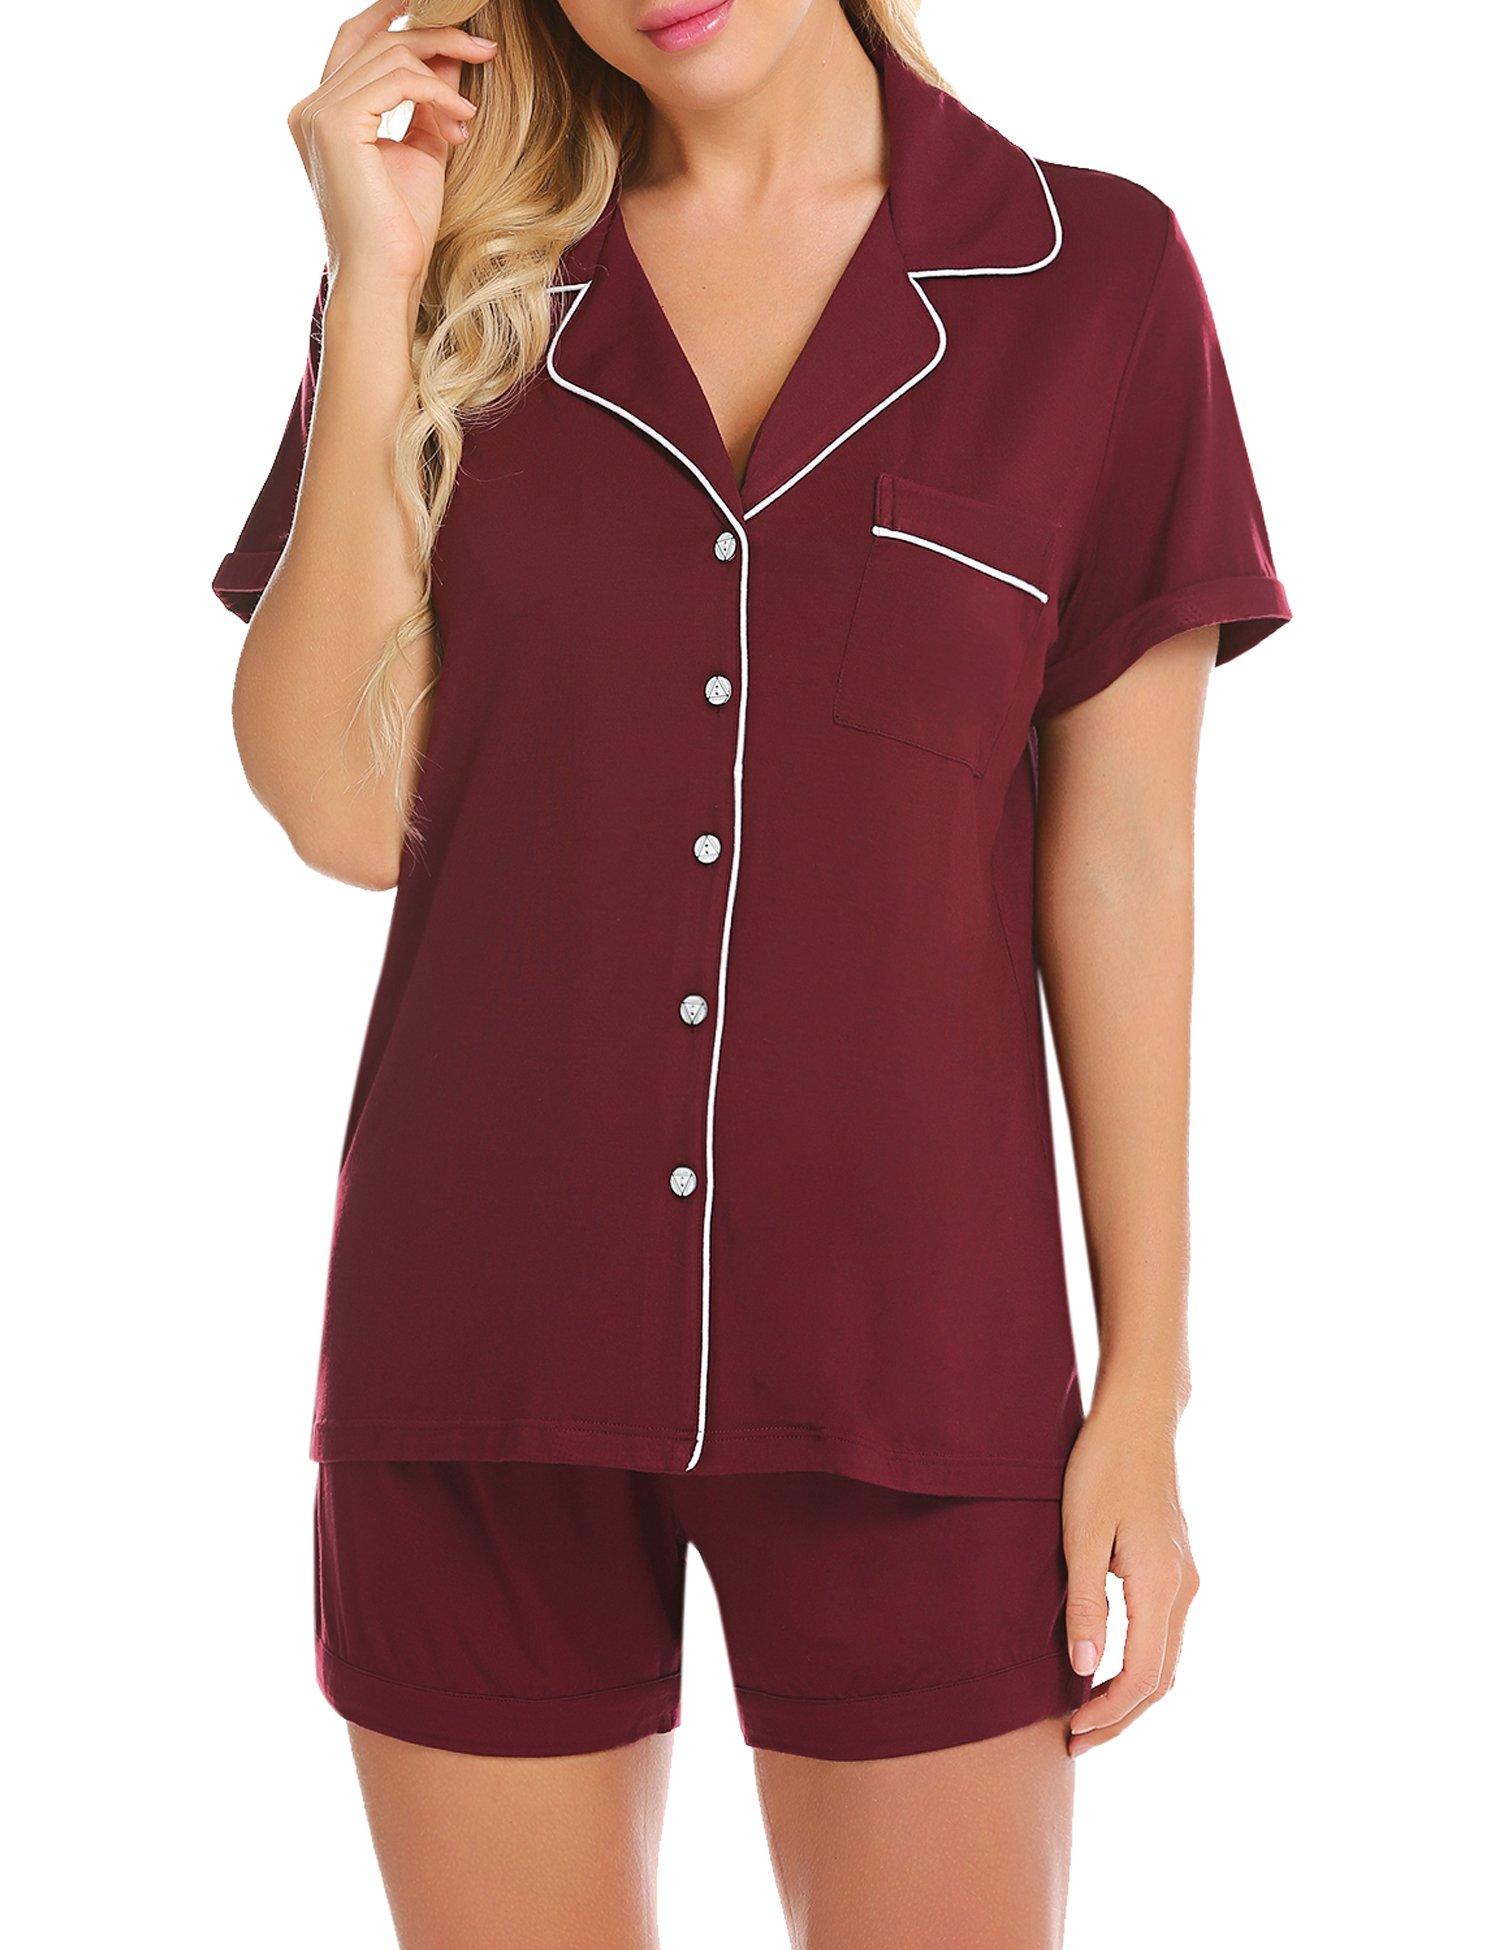 Ekouaer Short Sleeve Lounge Set Women's Sleepwear Button Down Pajama Set (Wine Red,S)